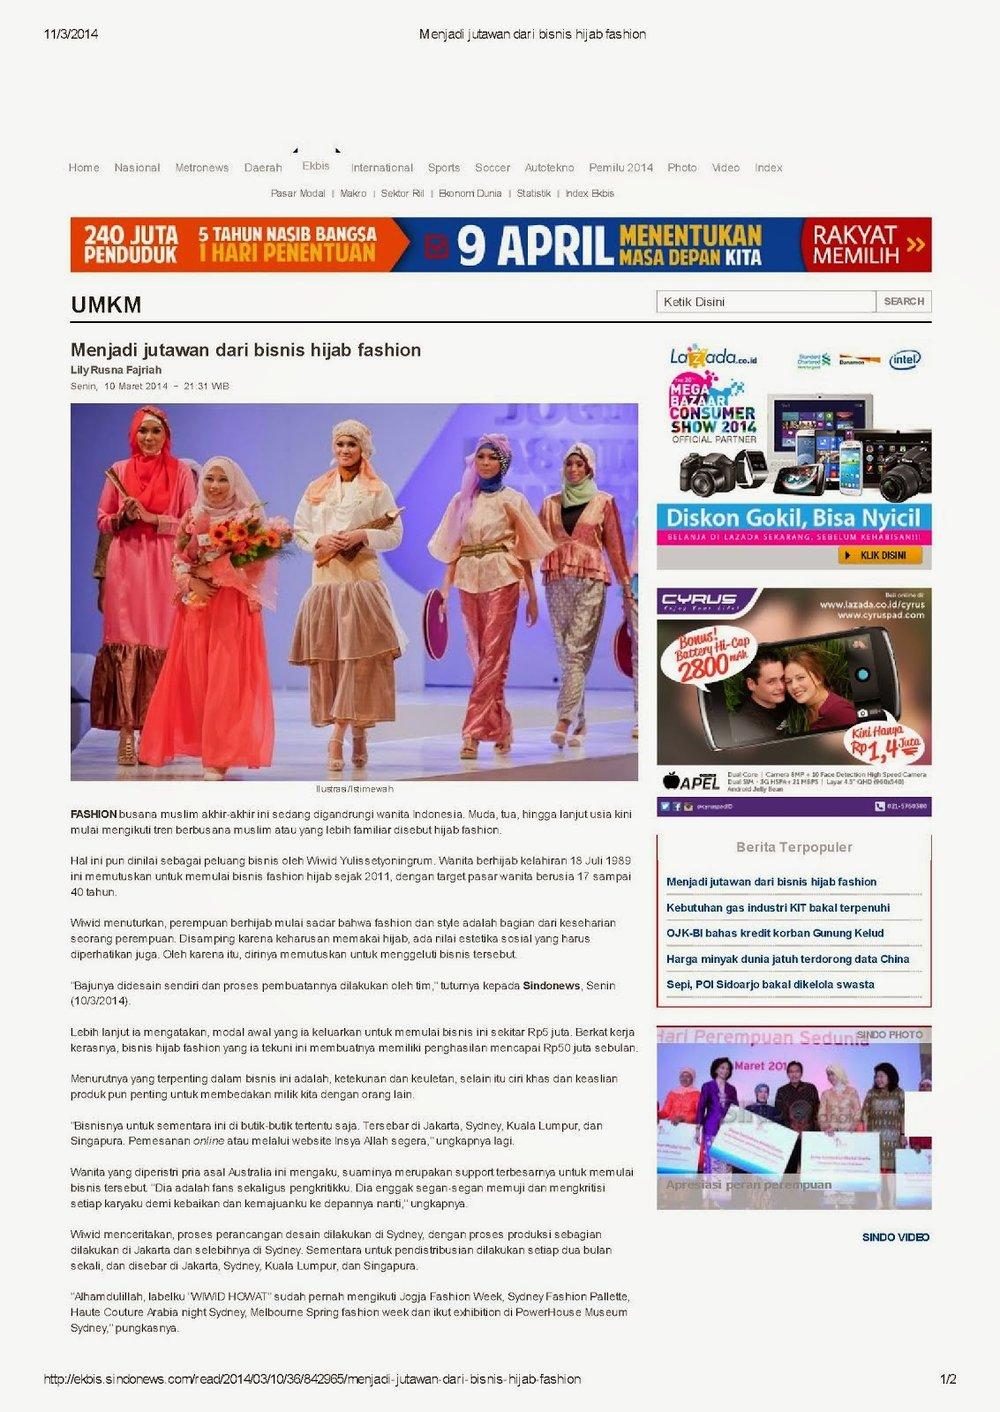 2014 - Sindo news.jpg